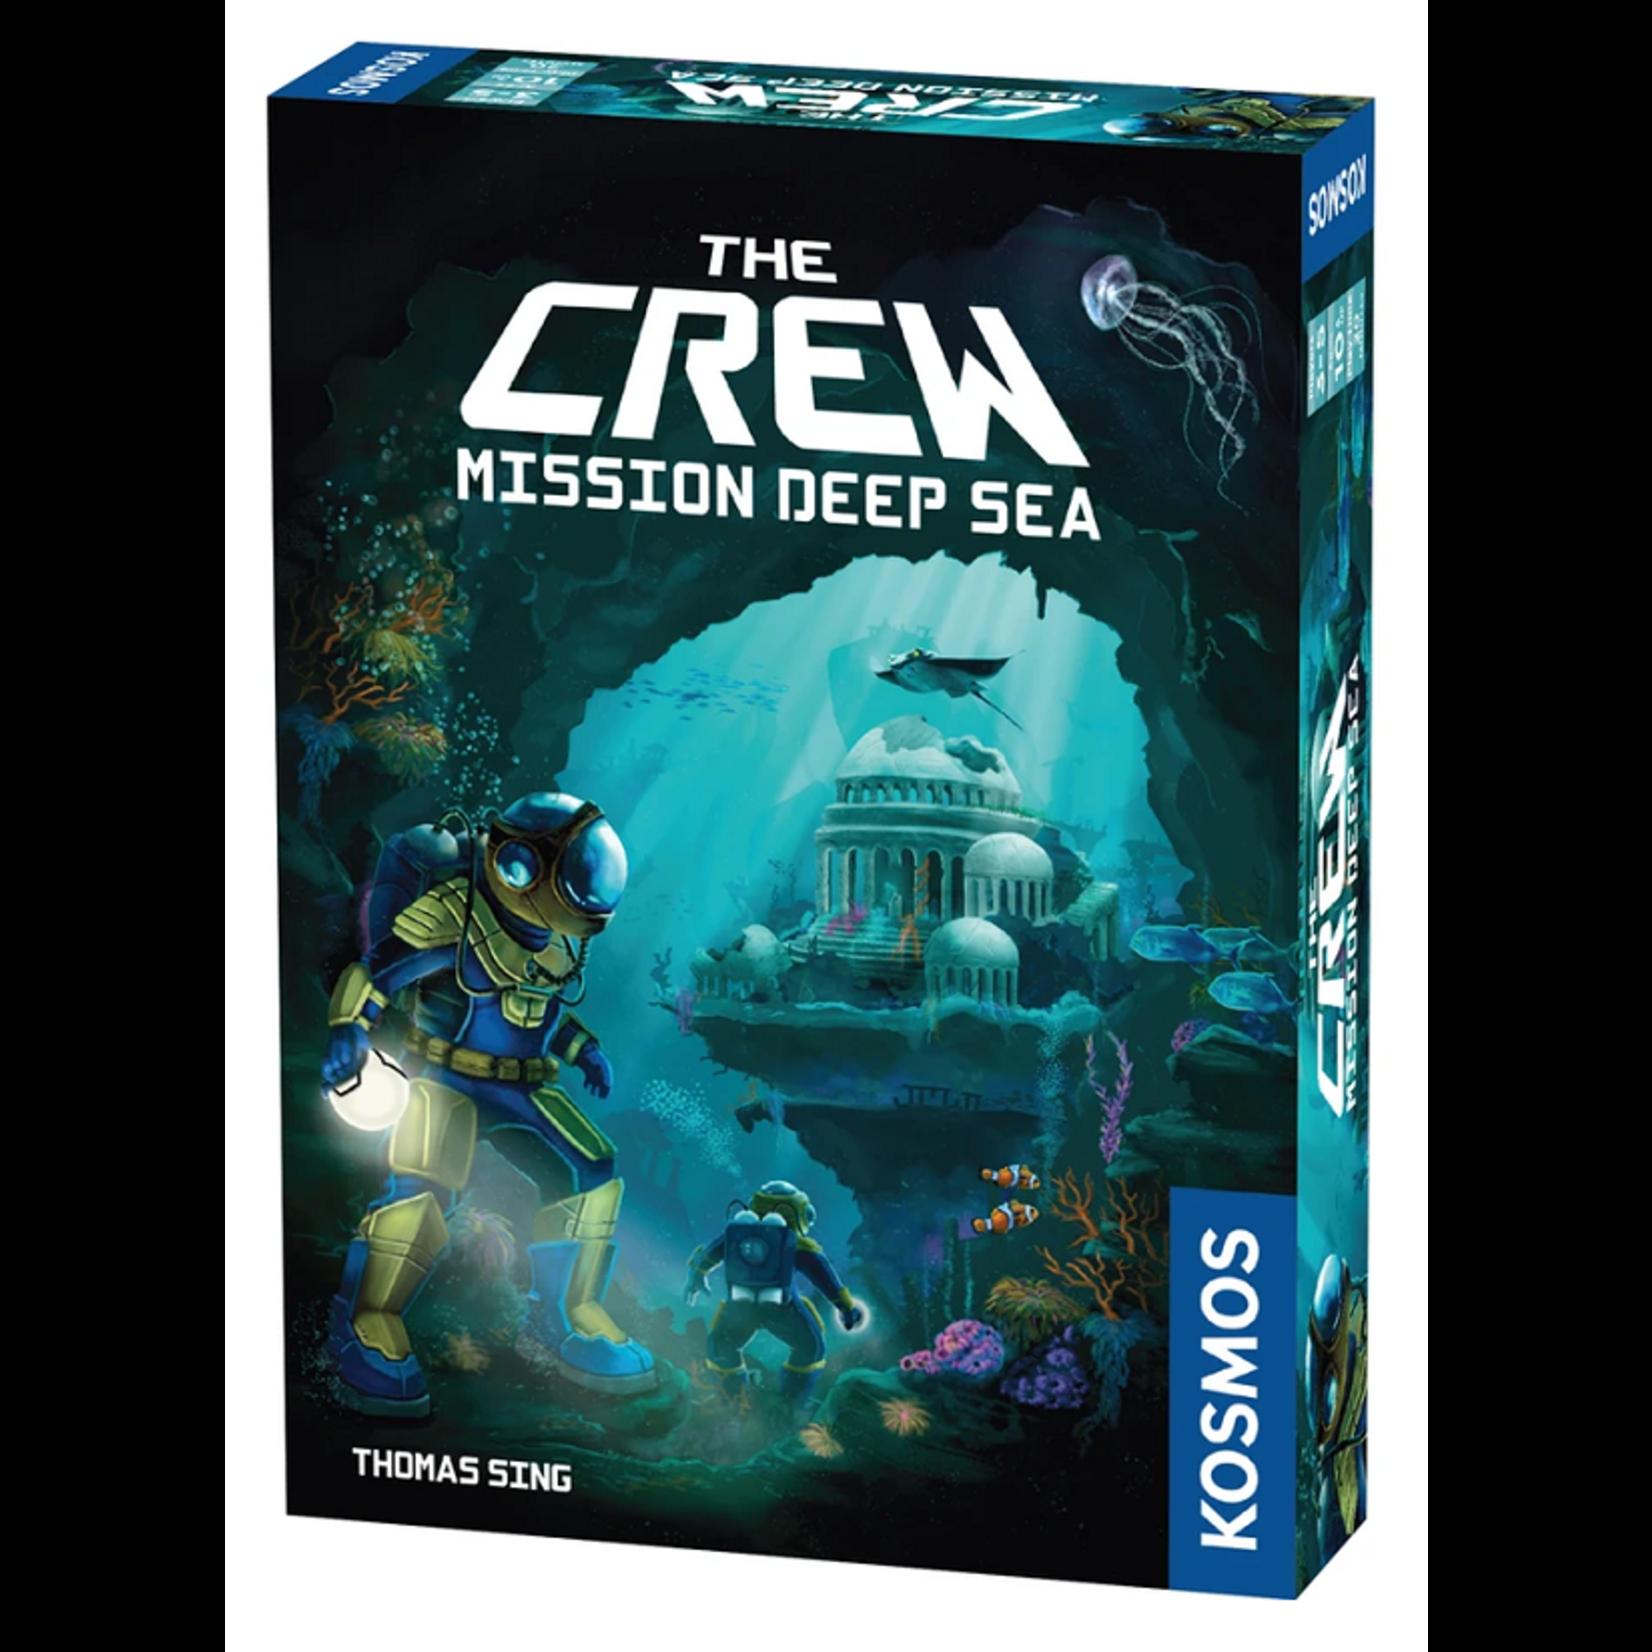 The Crew Mission Deep Sea